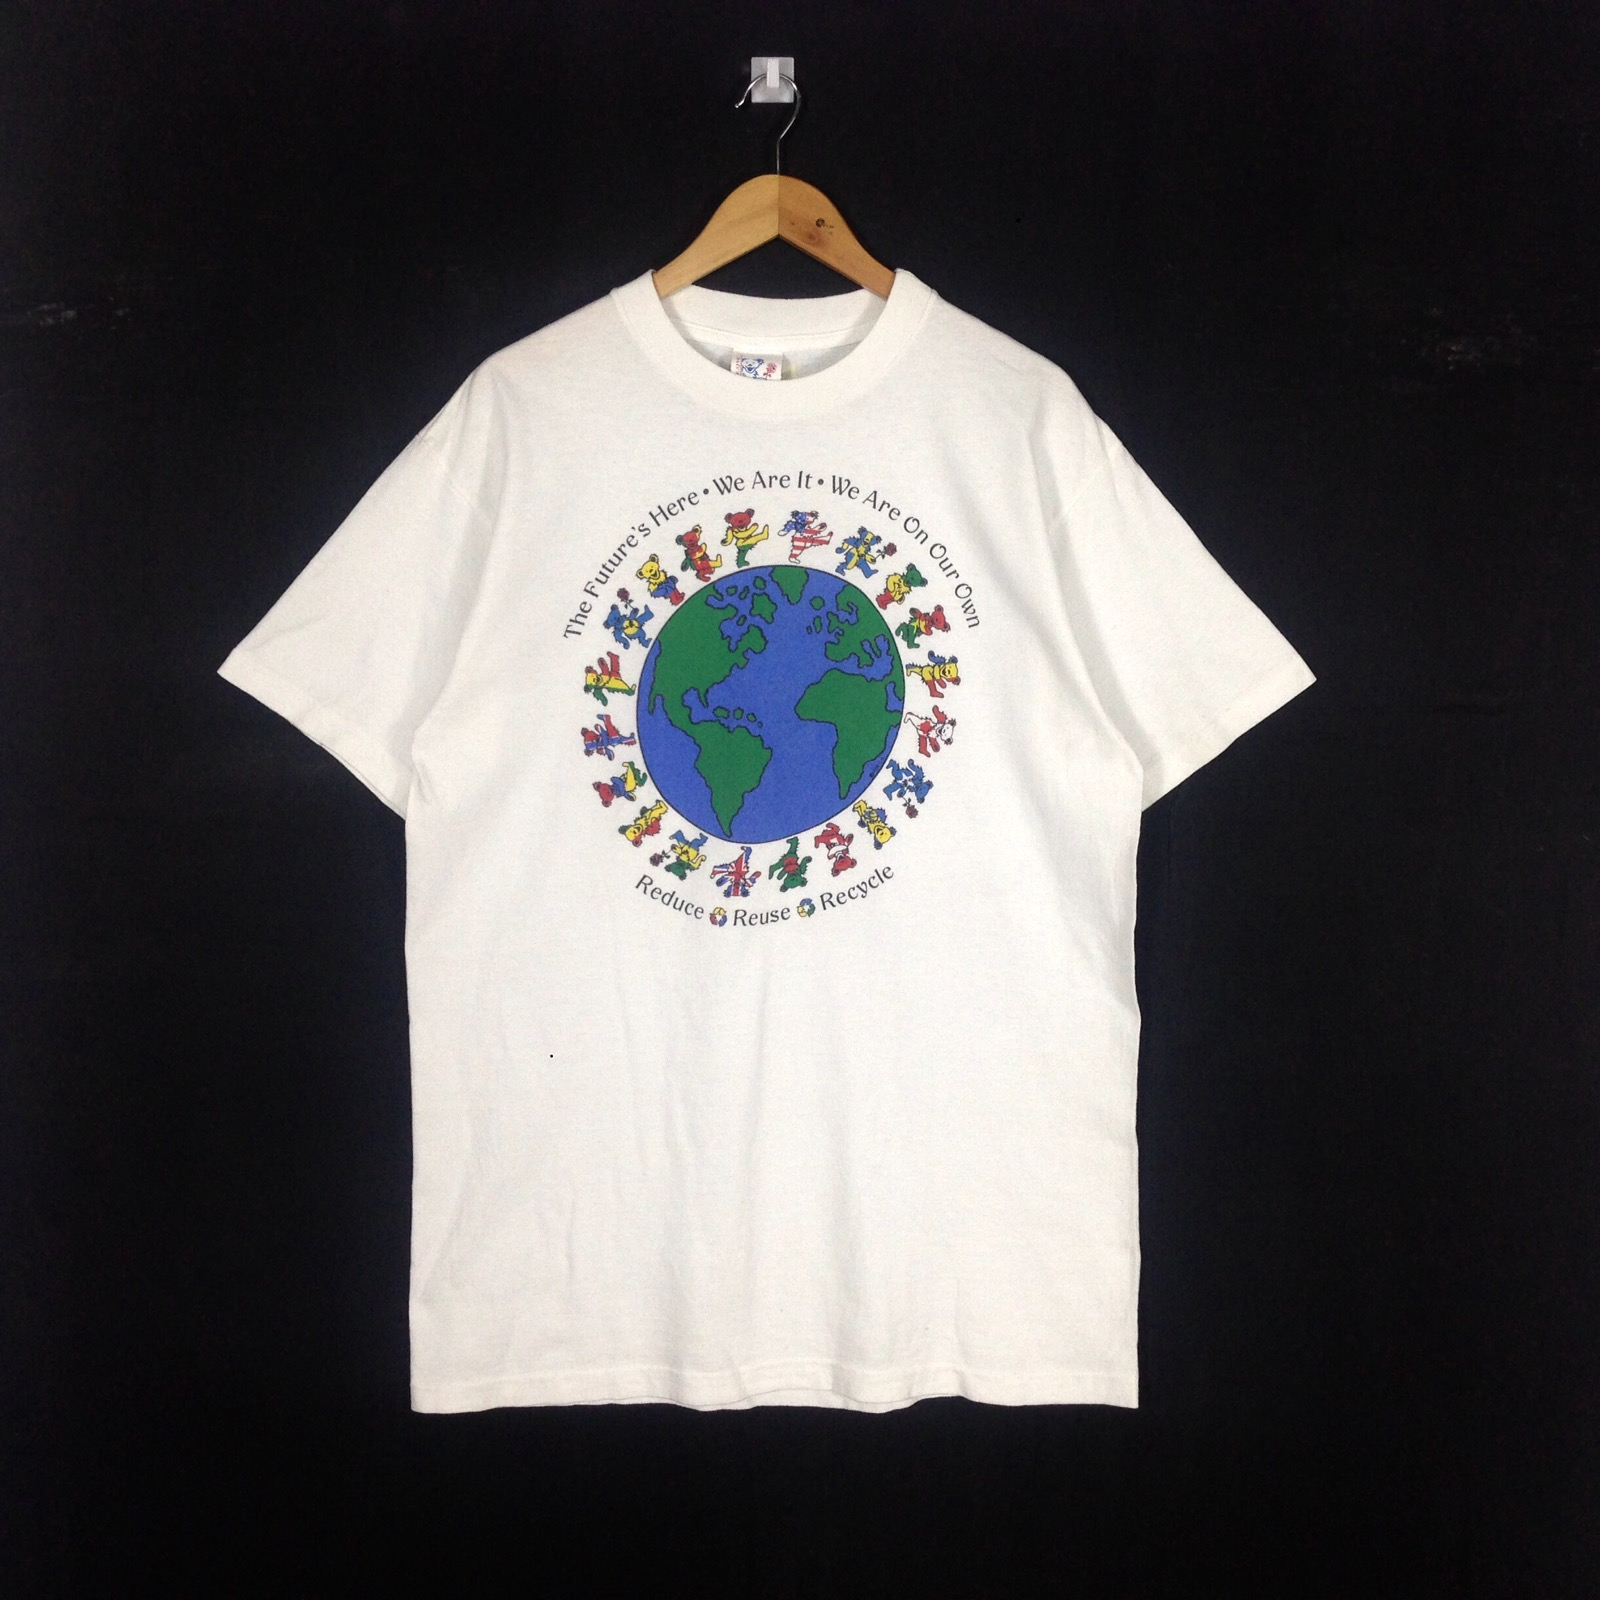 3593e28b Vintage Vintage Band Grateful Dead Music Concert Rock T-shirt | Grailed